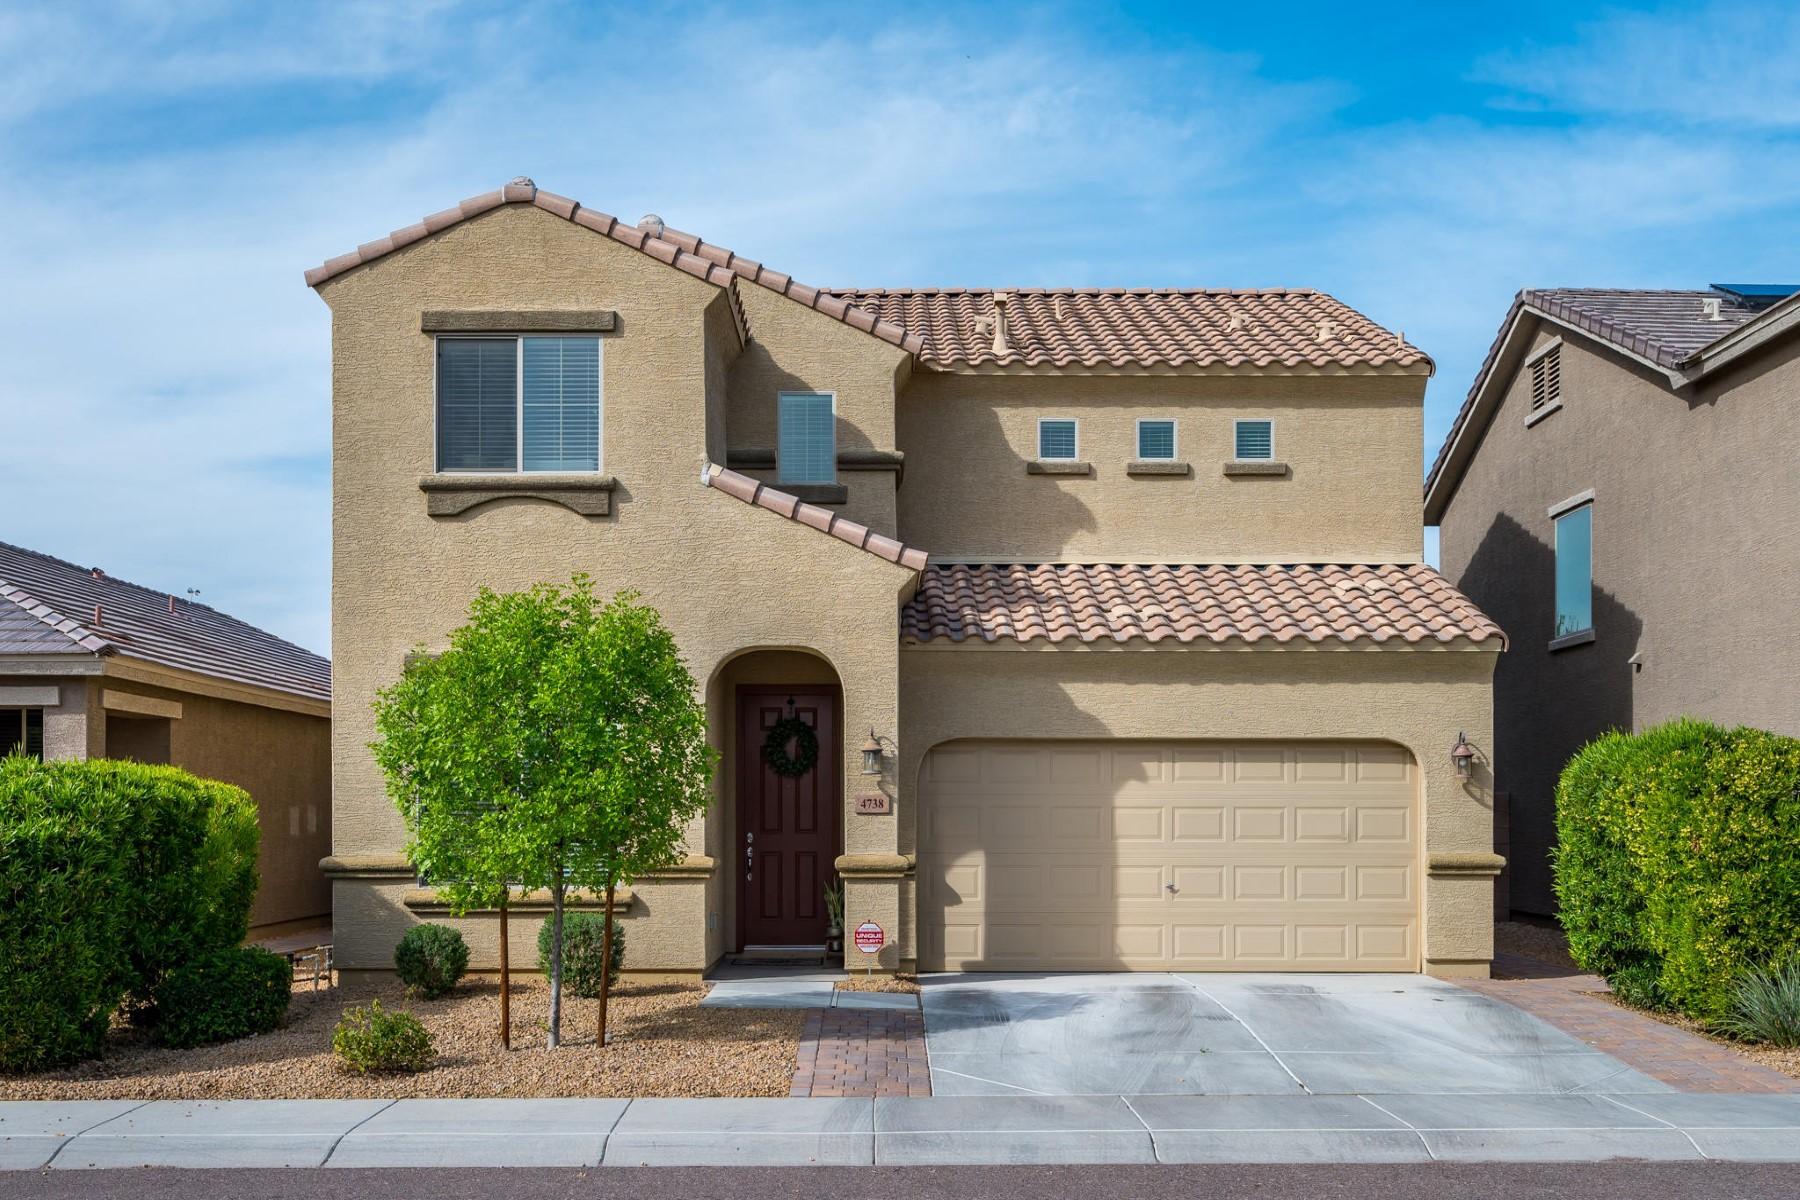 Single Family Homes για την Πώληση στο Sunburst Manor 4738 W GELDING DR, Glendale, Αριζονα 85306 Ηνωμένες Πολιτείες